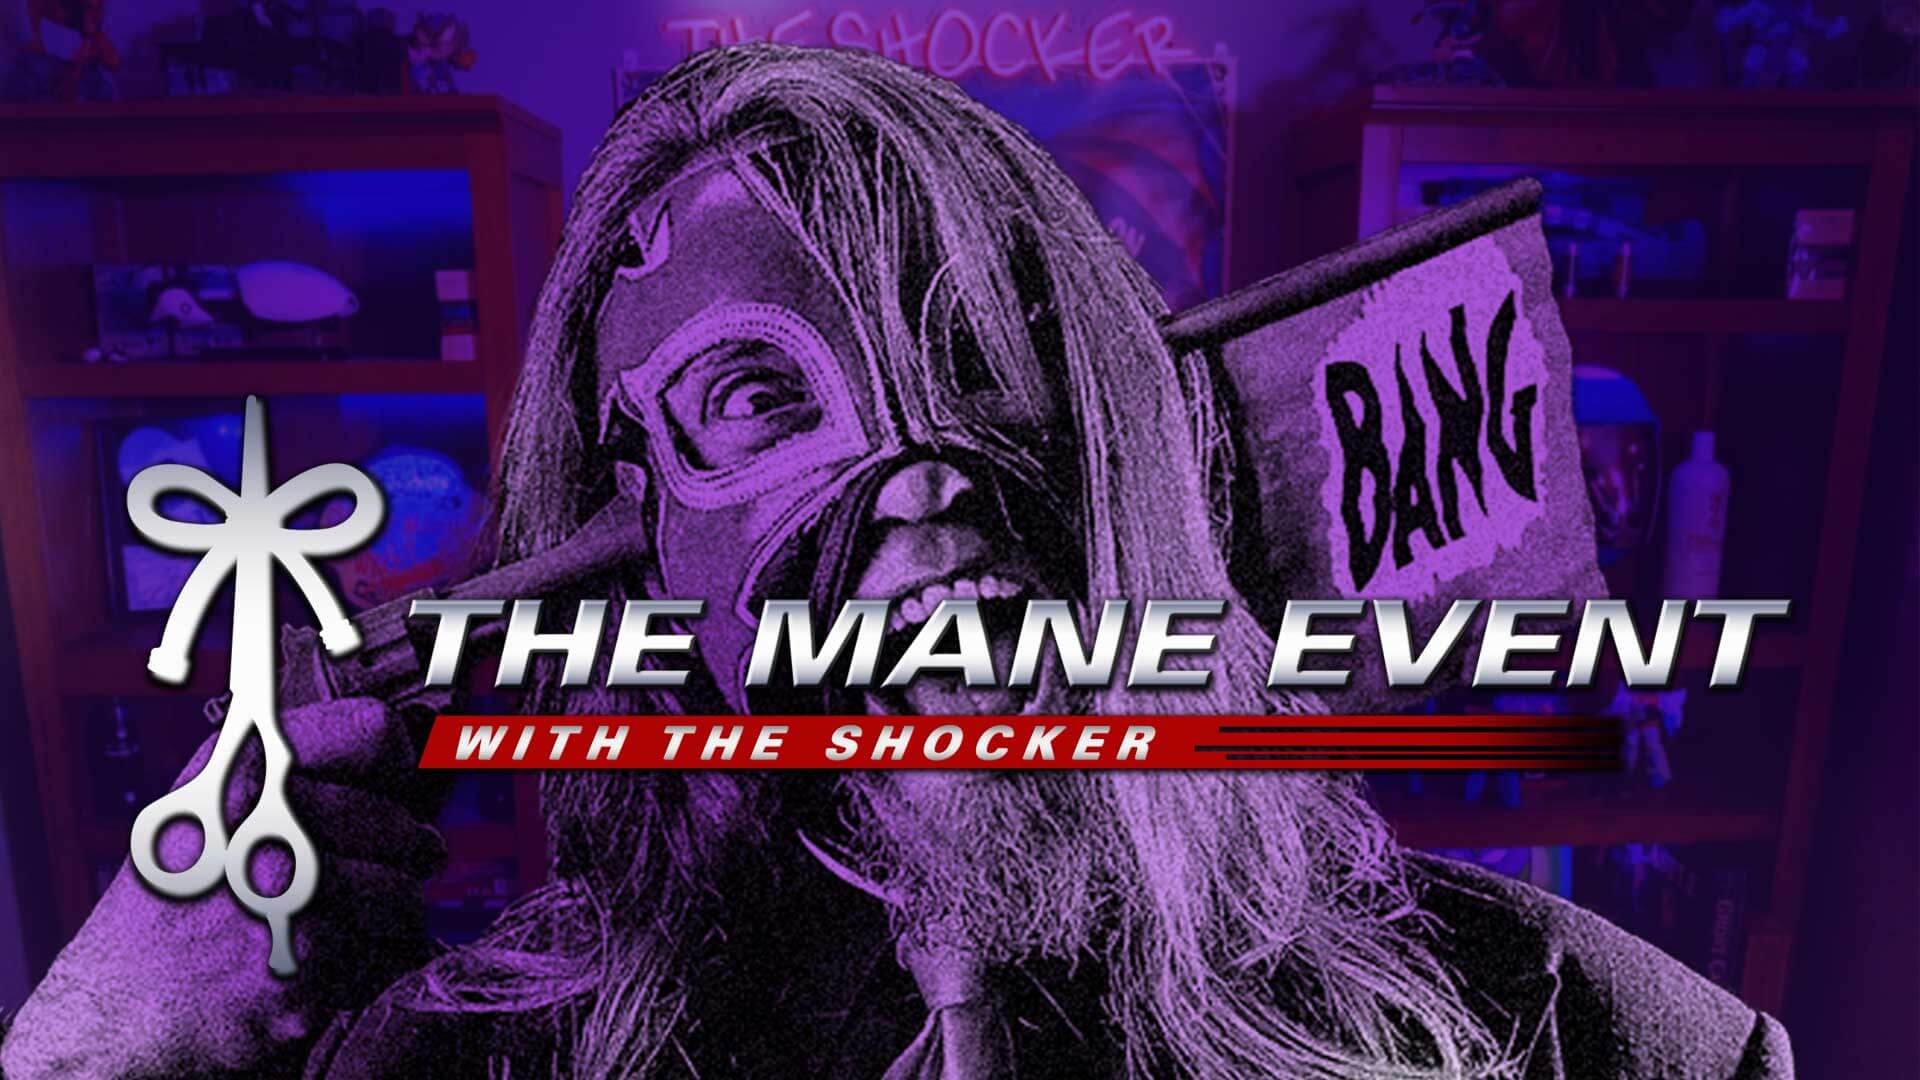 The Shocker Host of The Mane Event